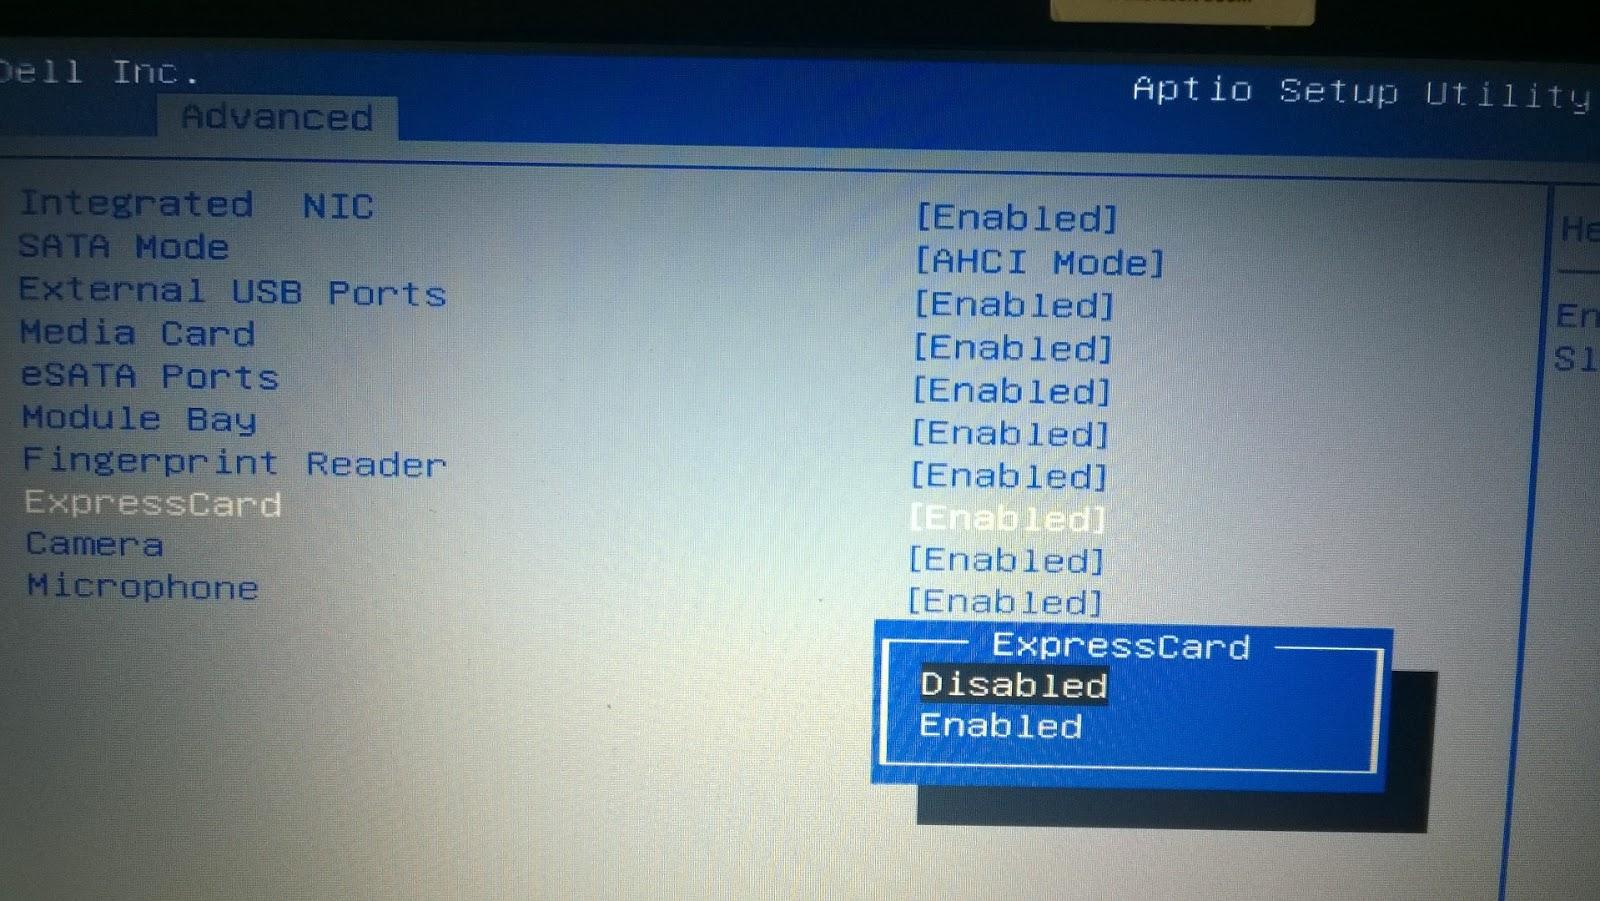 Memory Sieve: Dell Vostro 3300 fails to upgrade to Windows 10, error